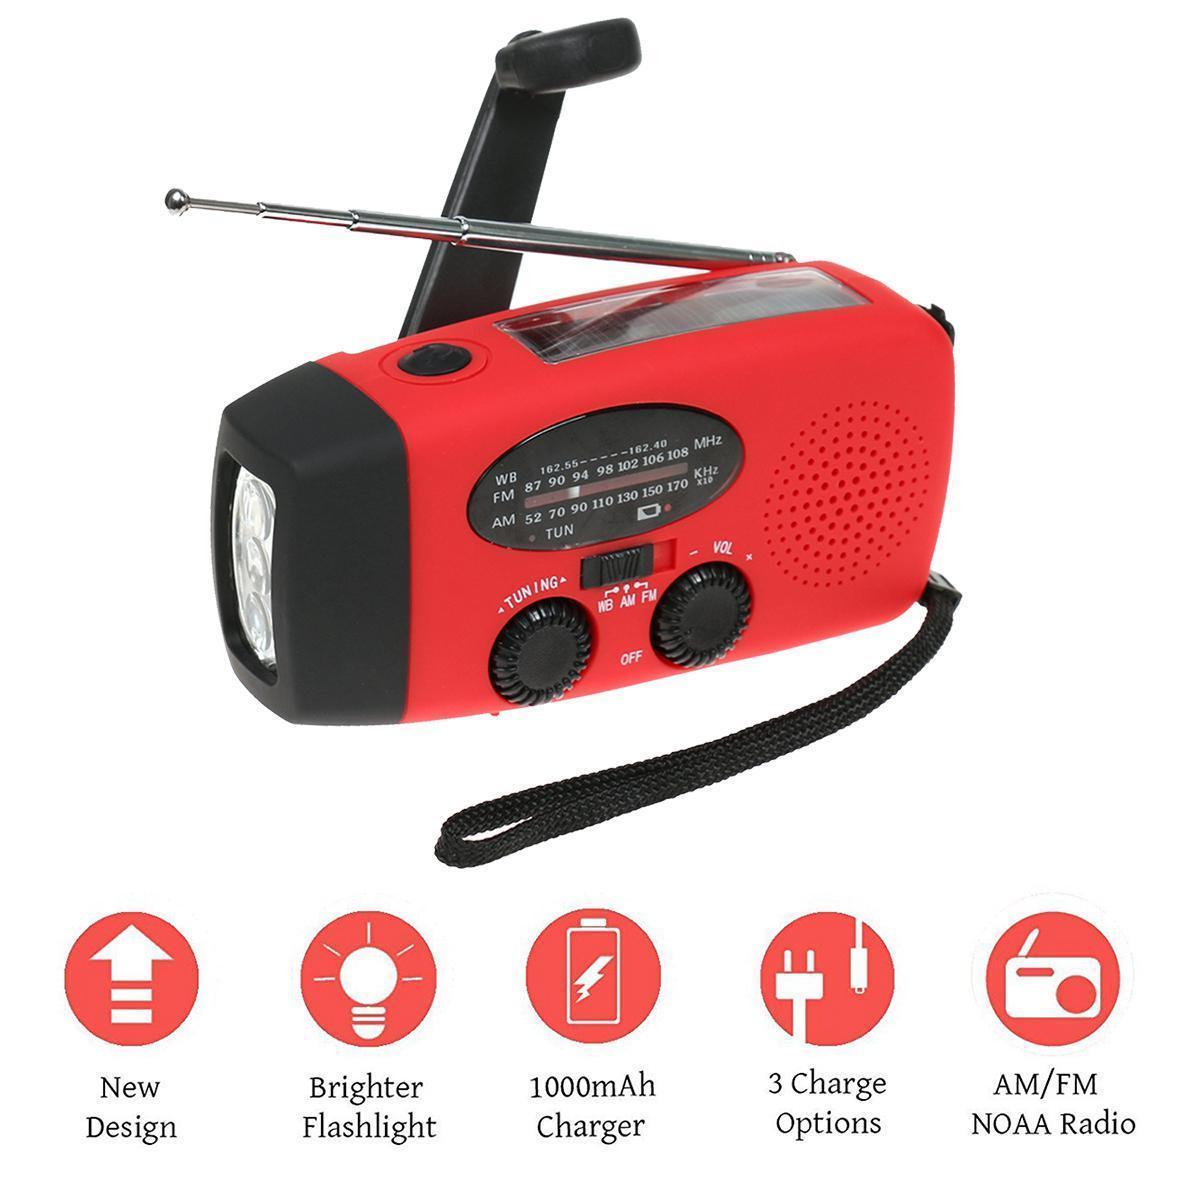 Buy niceEshop Radio & CD players at Best Prices Online in